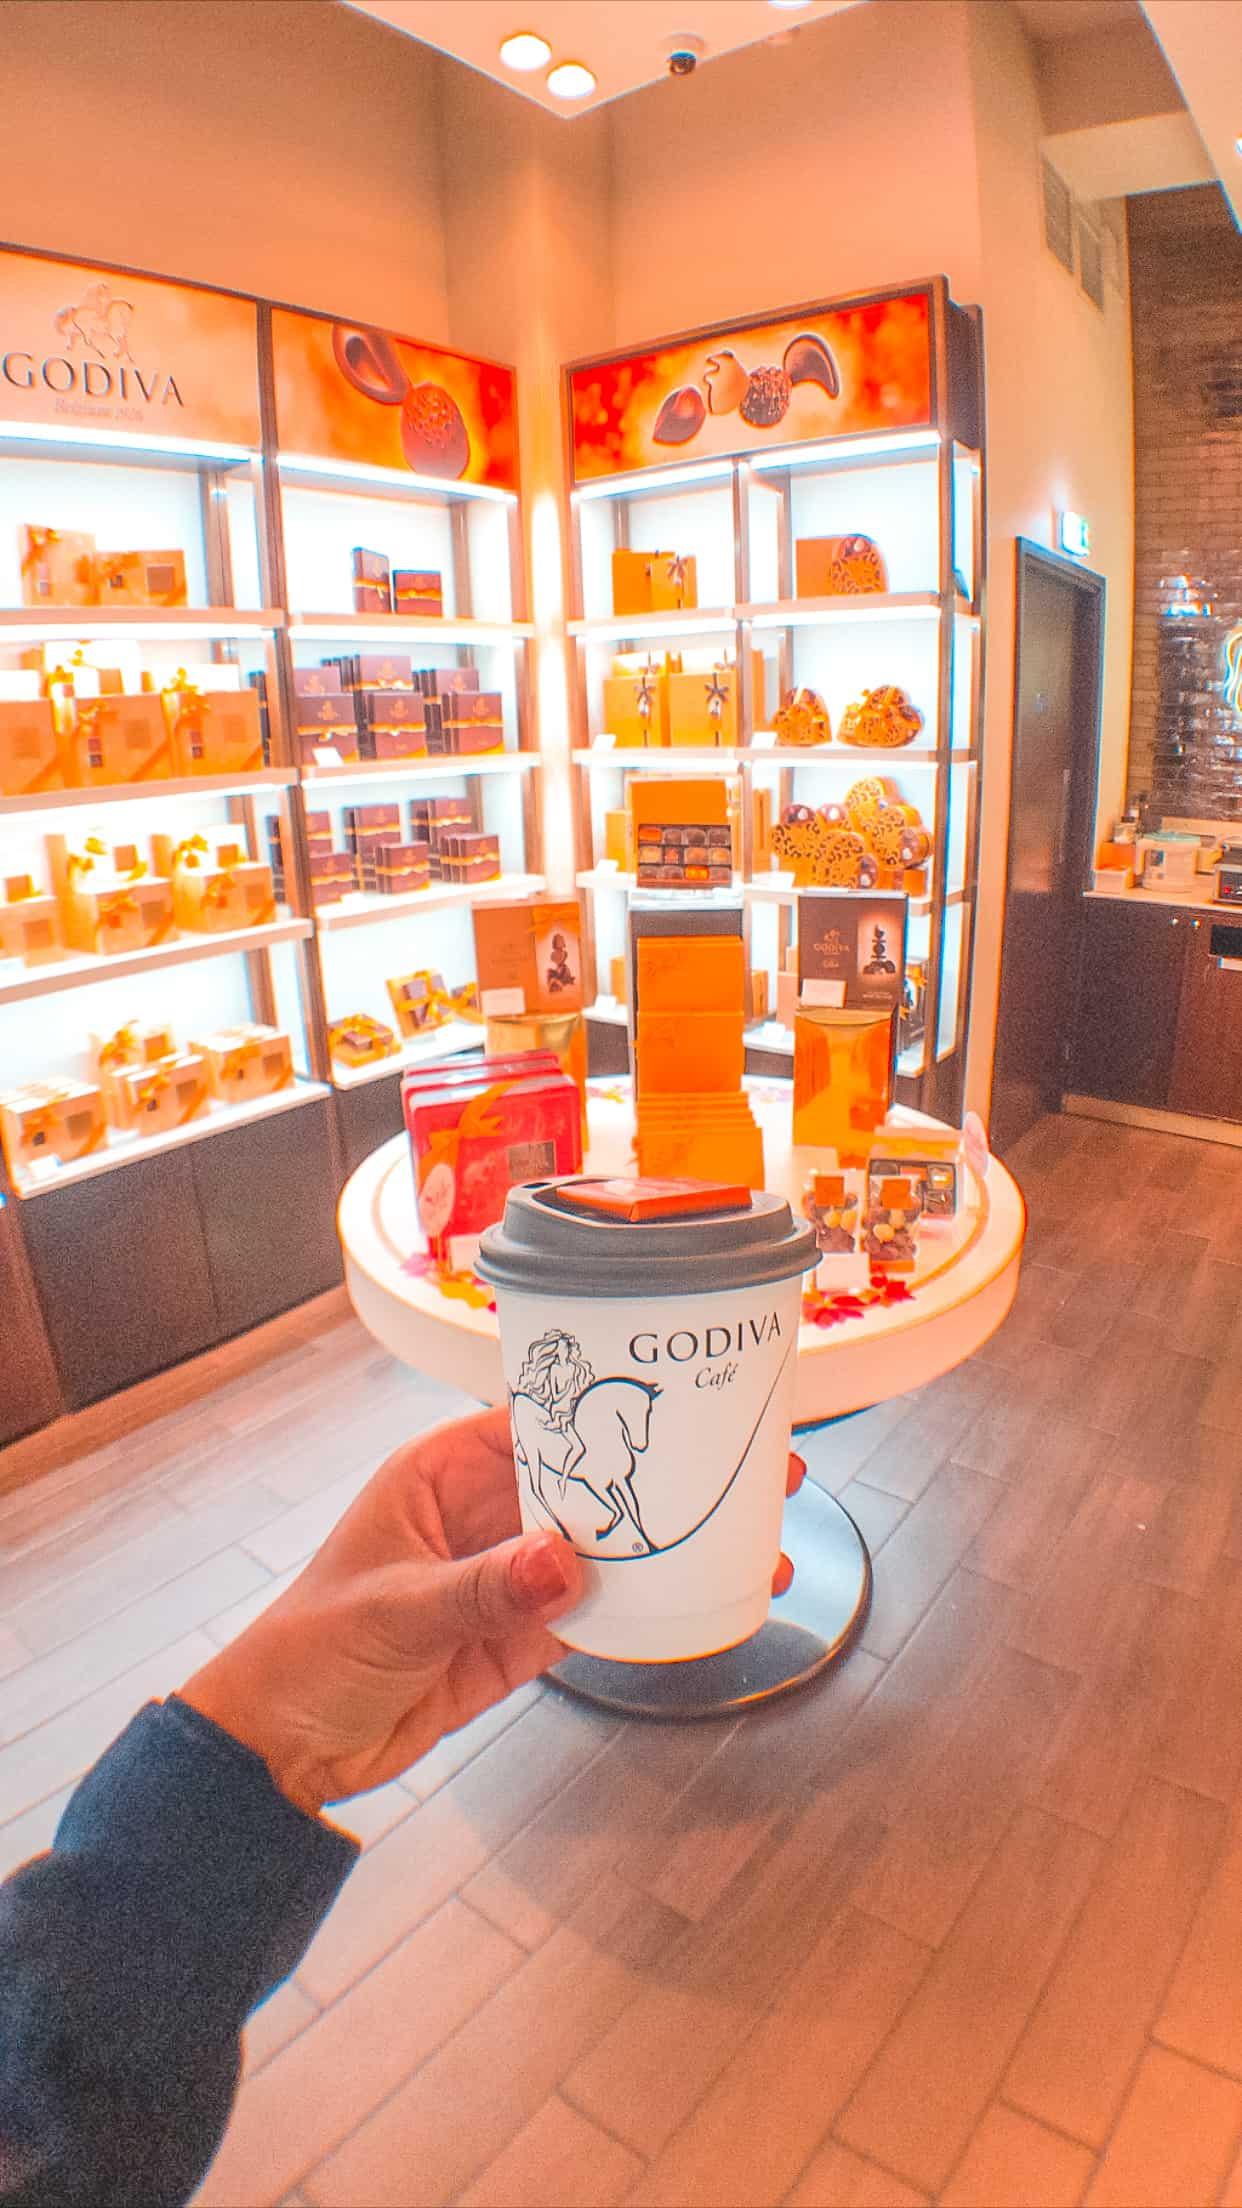 Godiva Hot Chocolate Canary Wharf